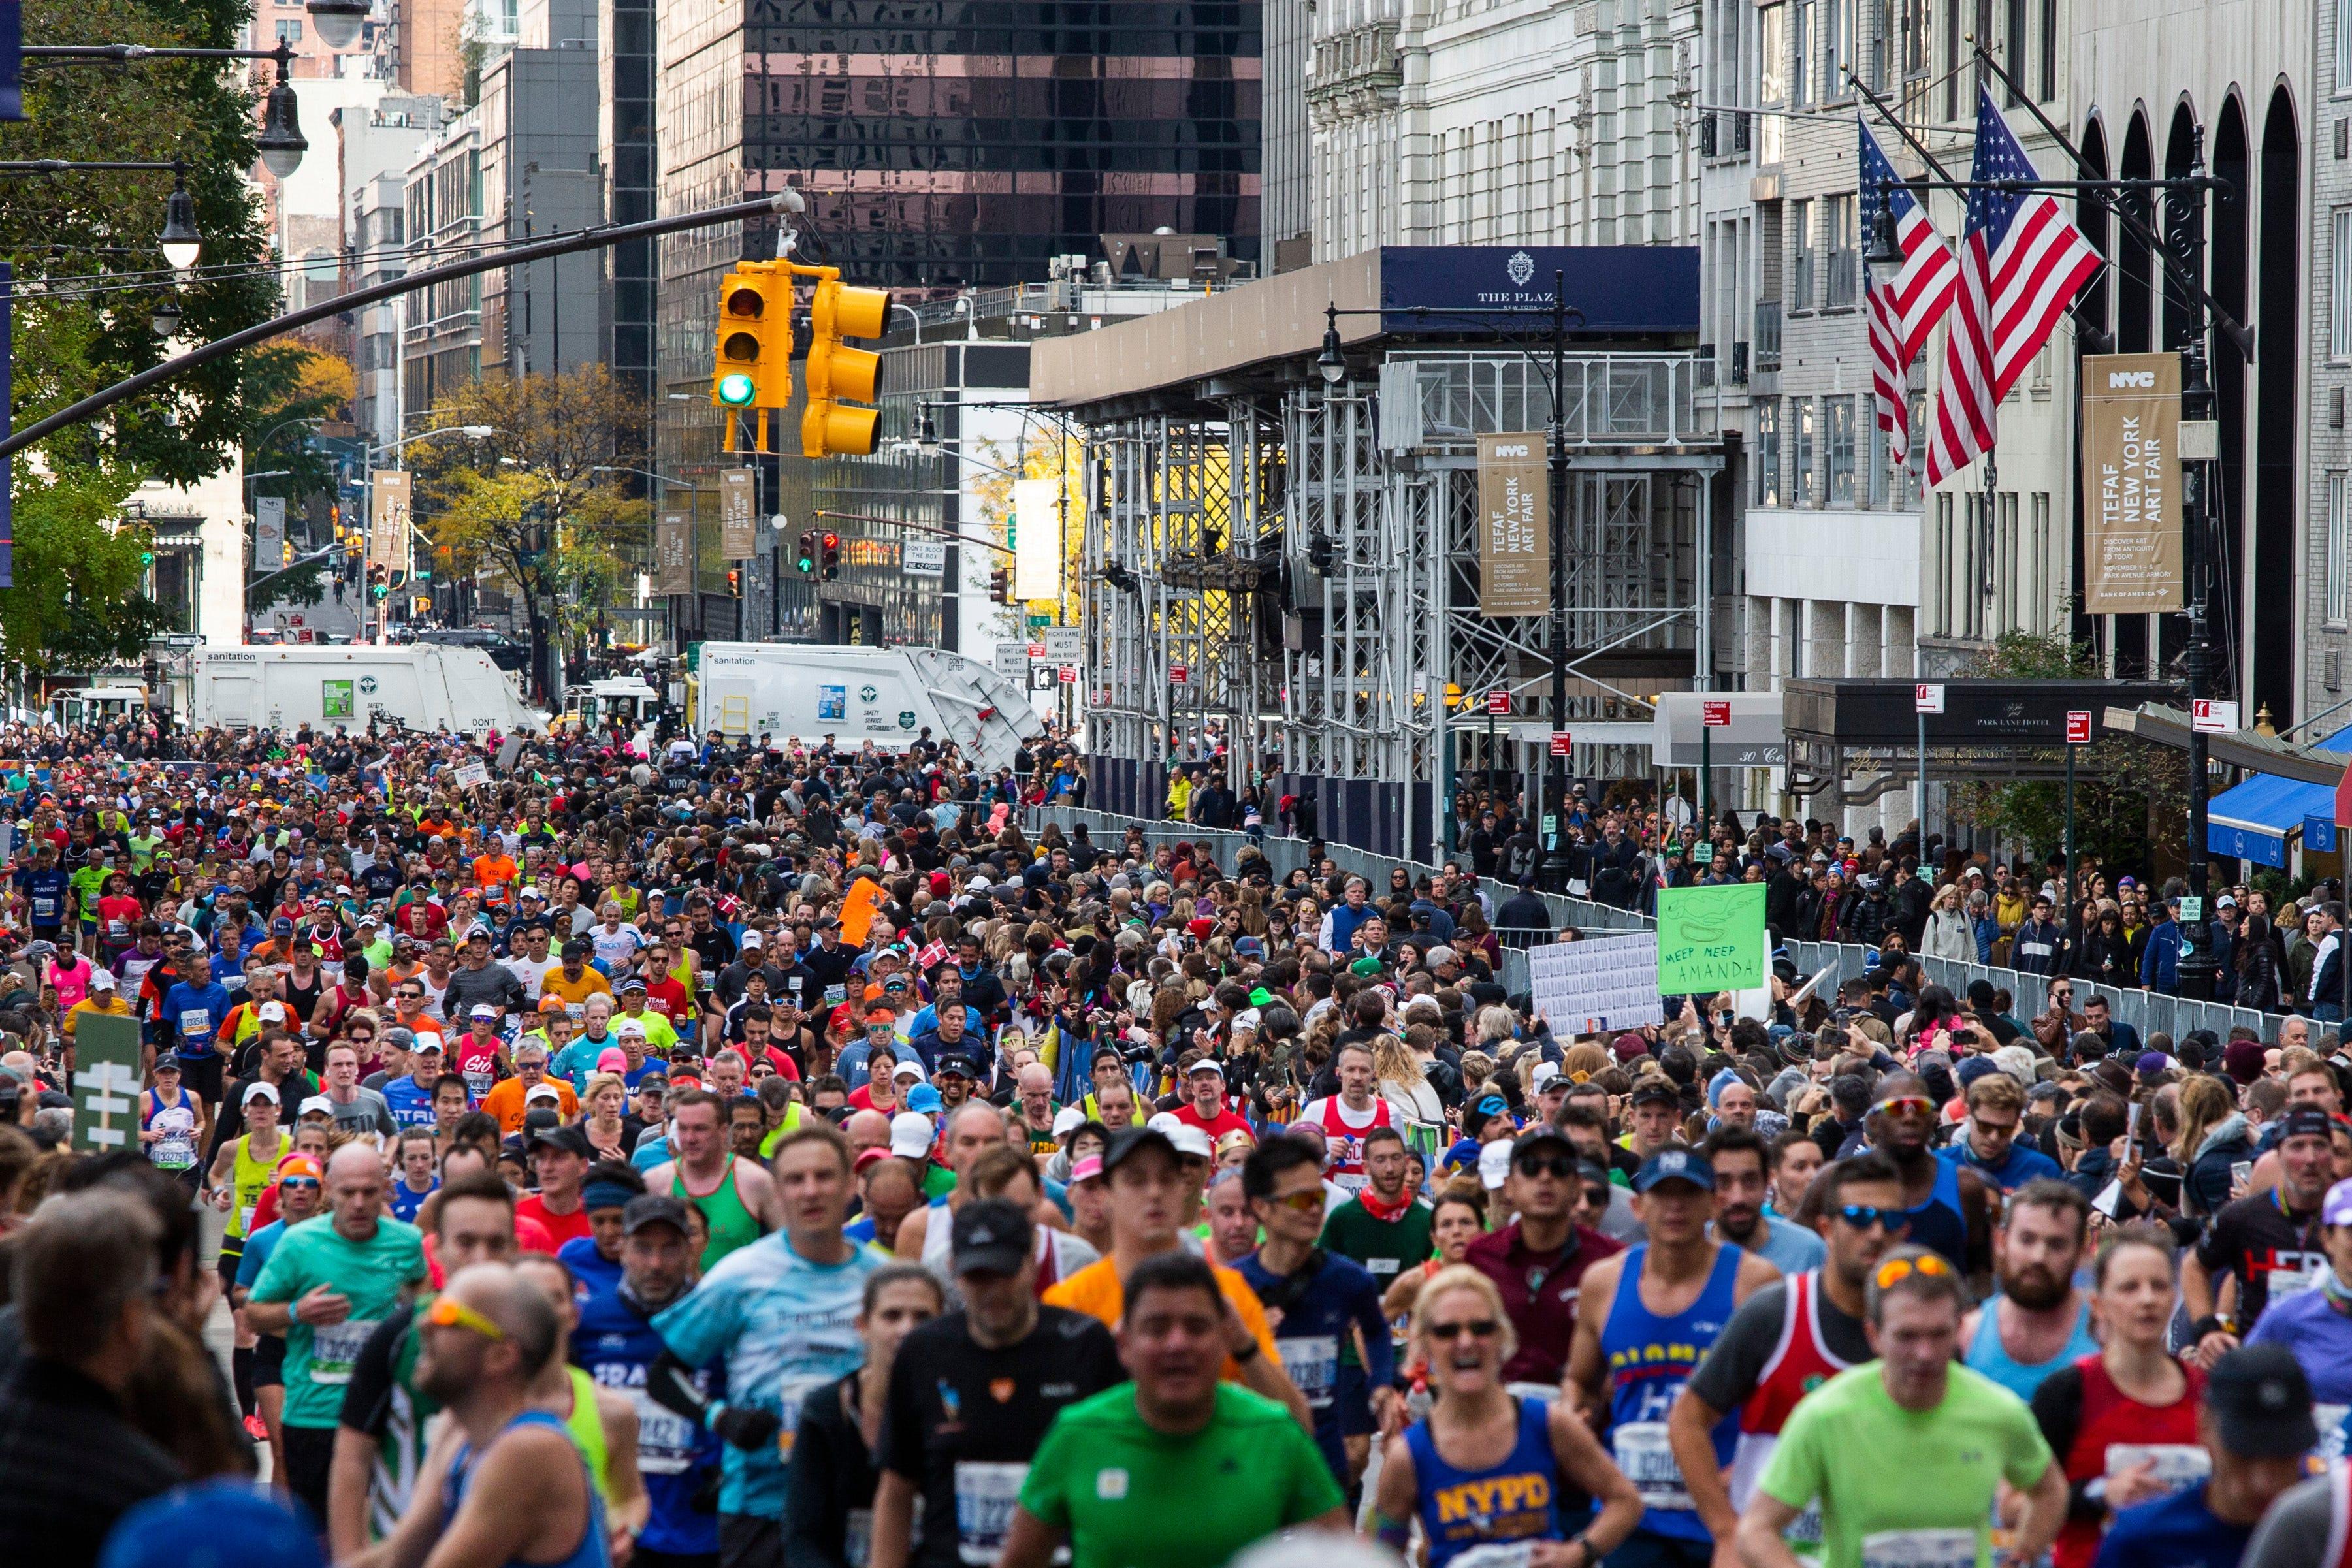 'I felt the emotion of an event': Virtual New York City Marathon has been far fromnormal